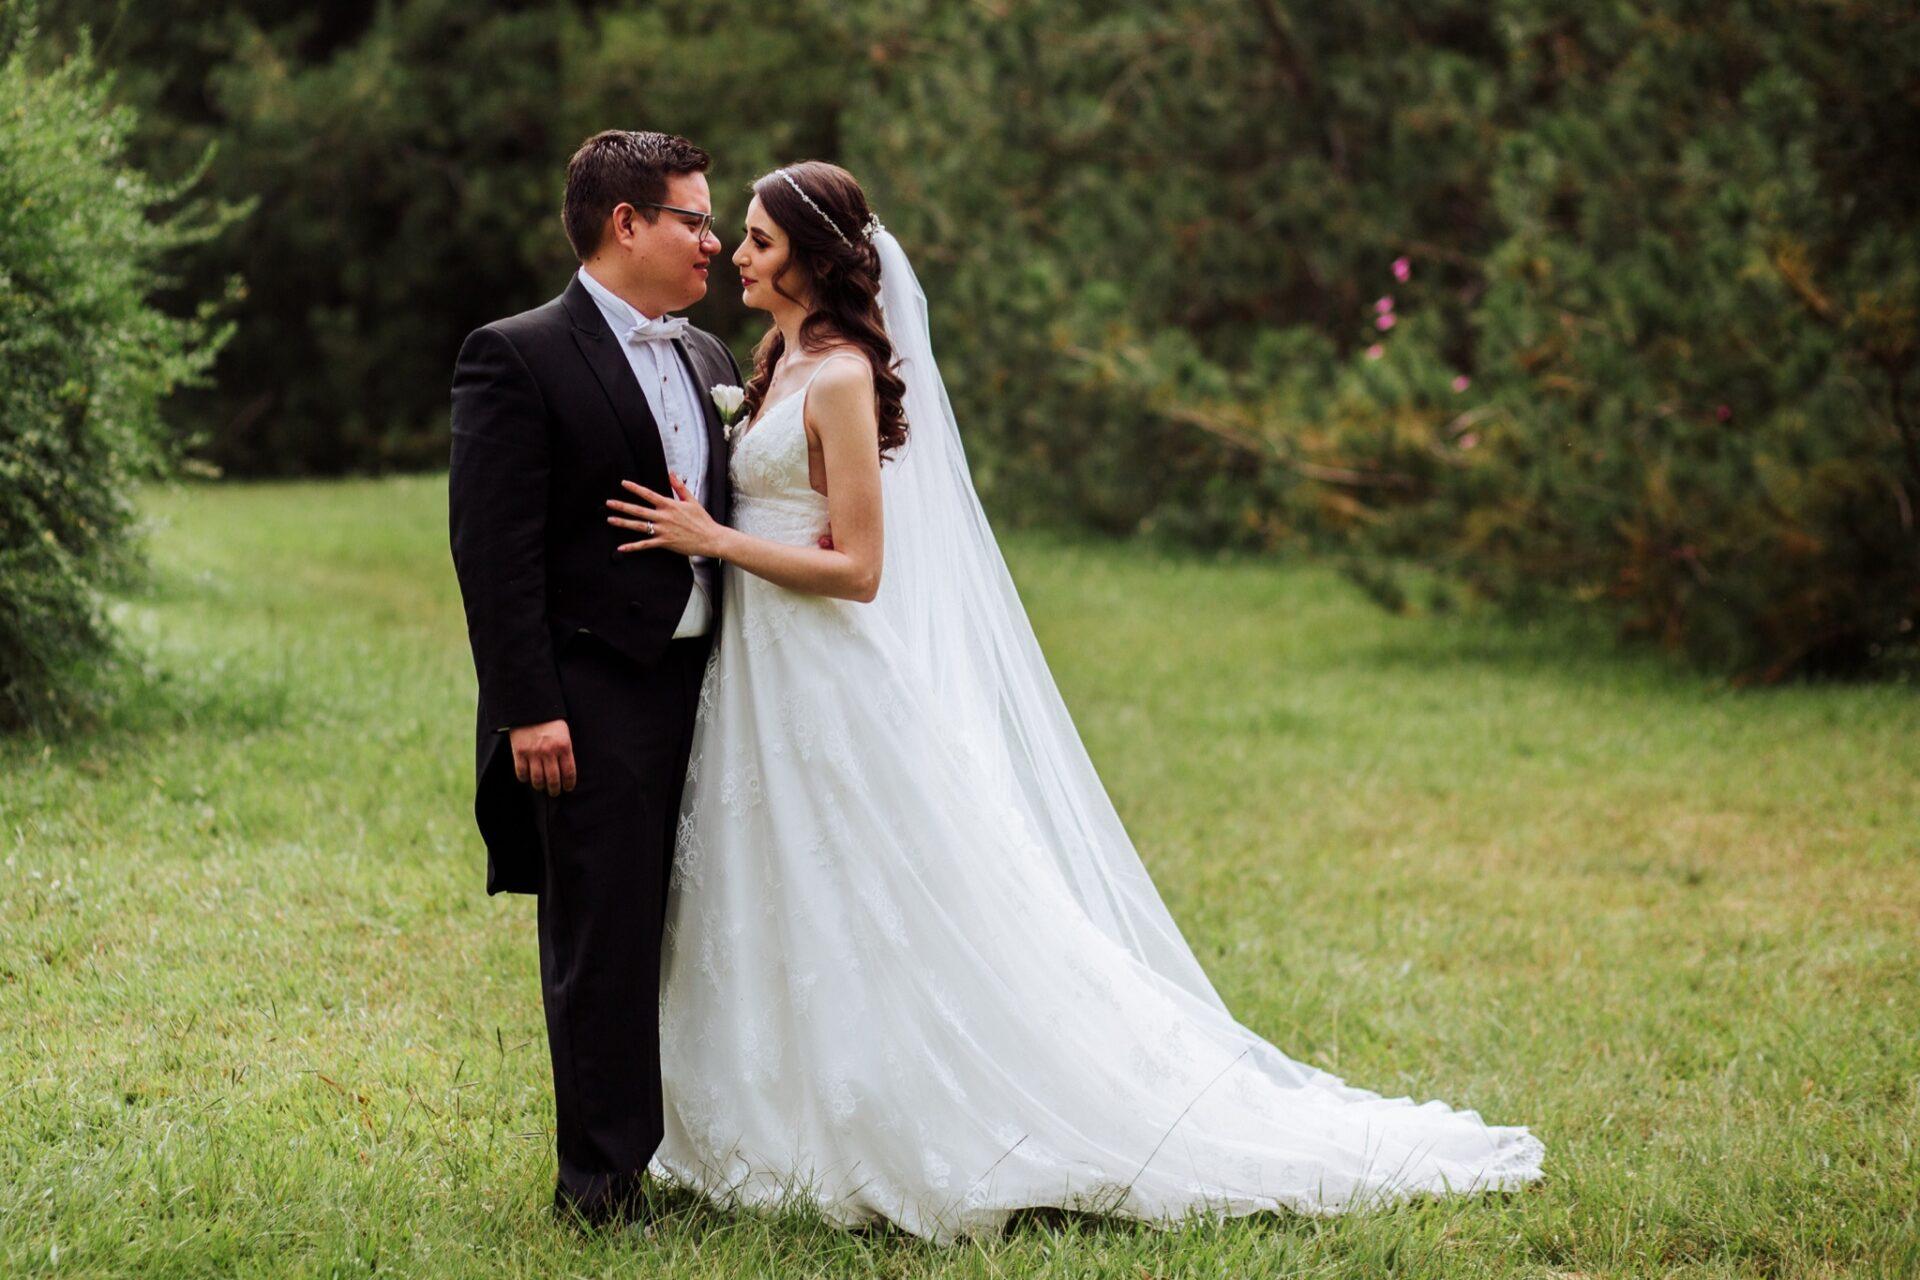 javier_noriega_fotografo_bodas_teul_zacatecas_wedding_photographer25a